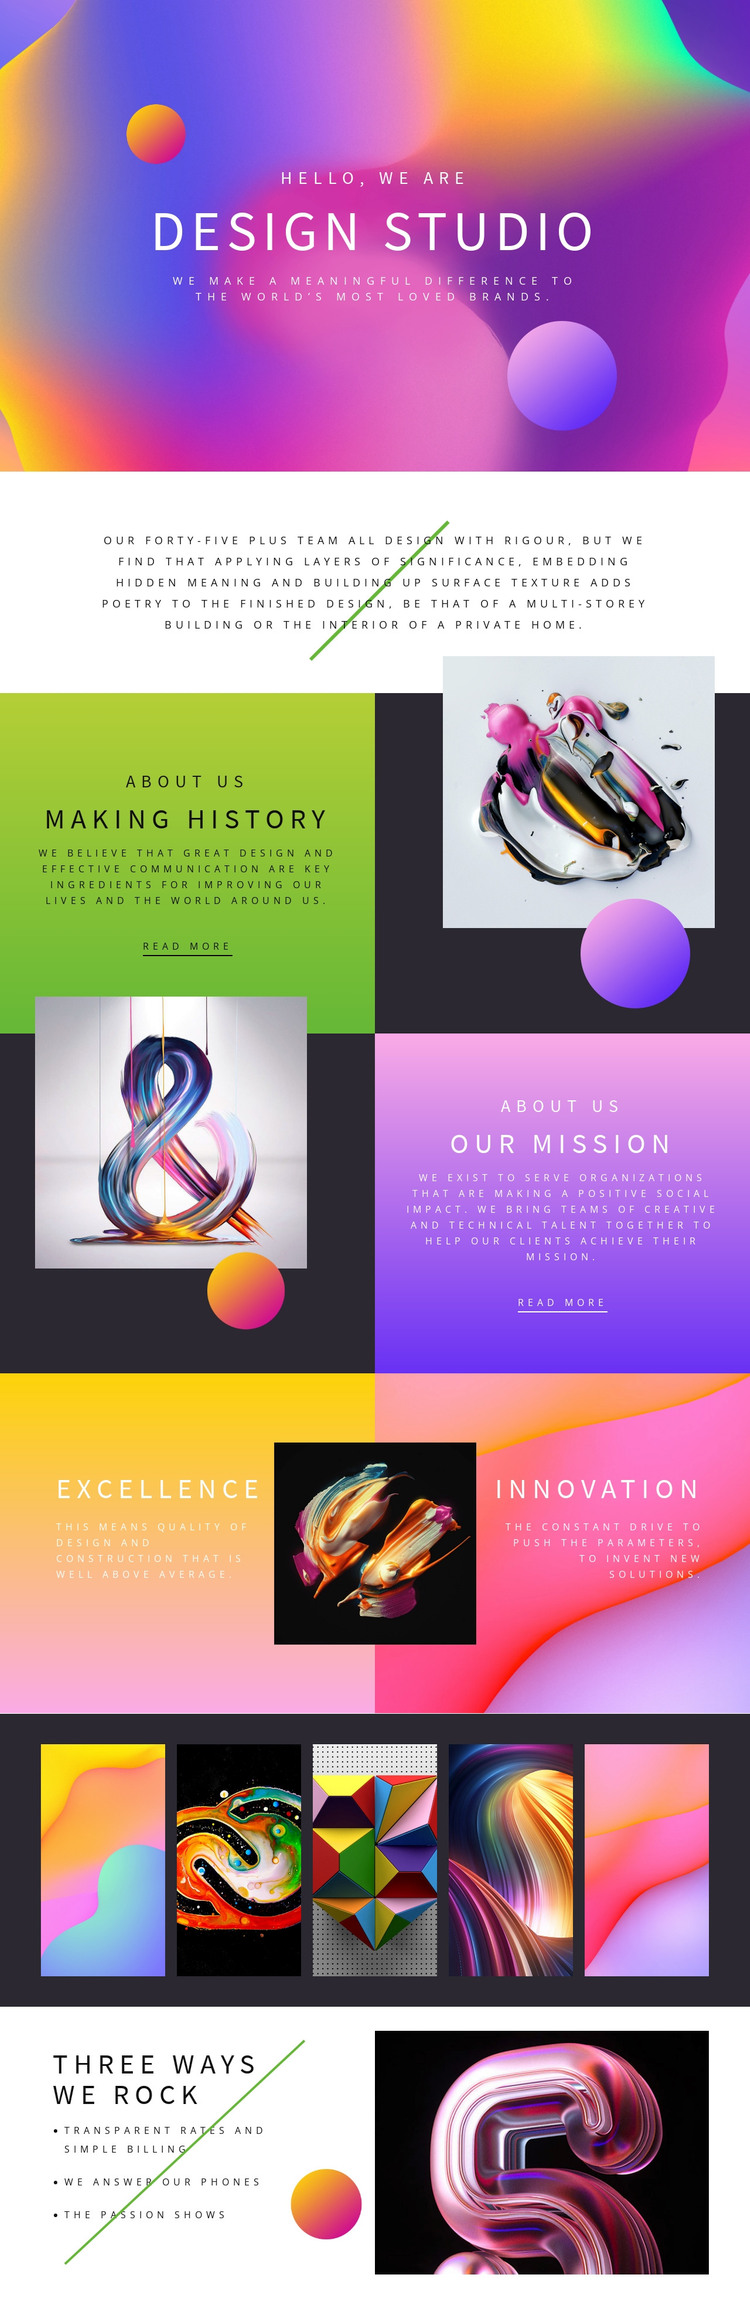 Progressive design art WordPress Theme